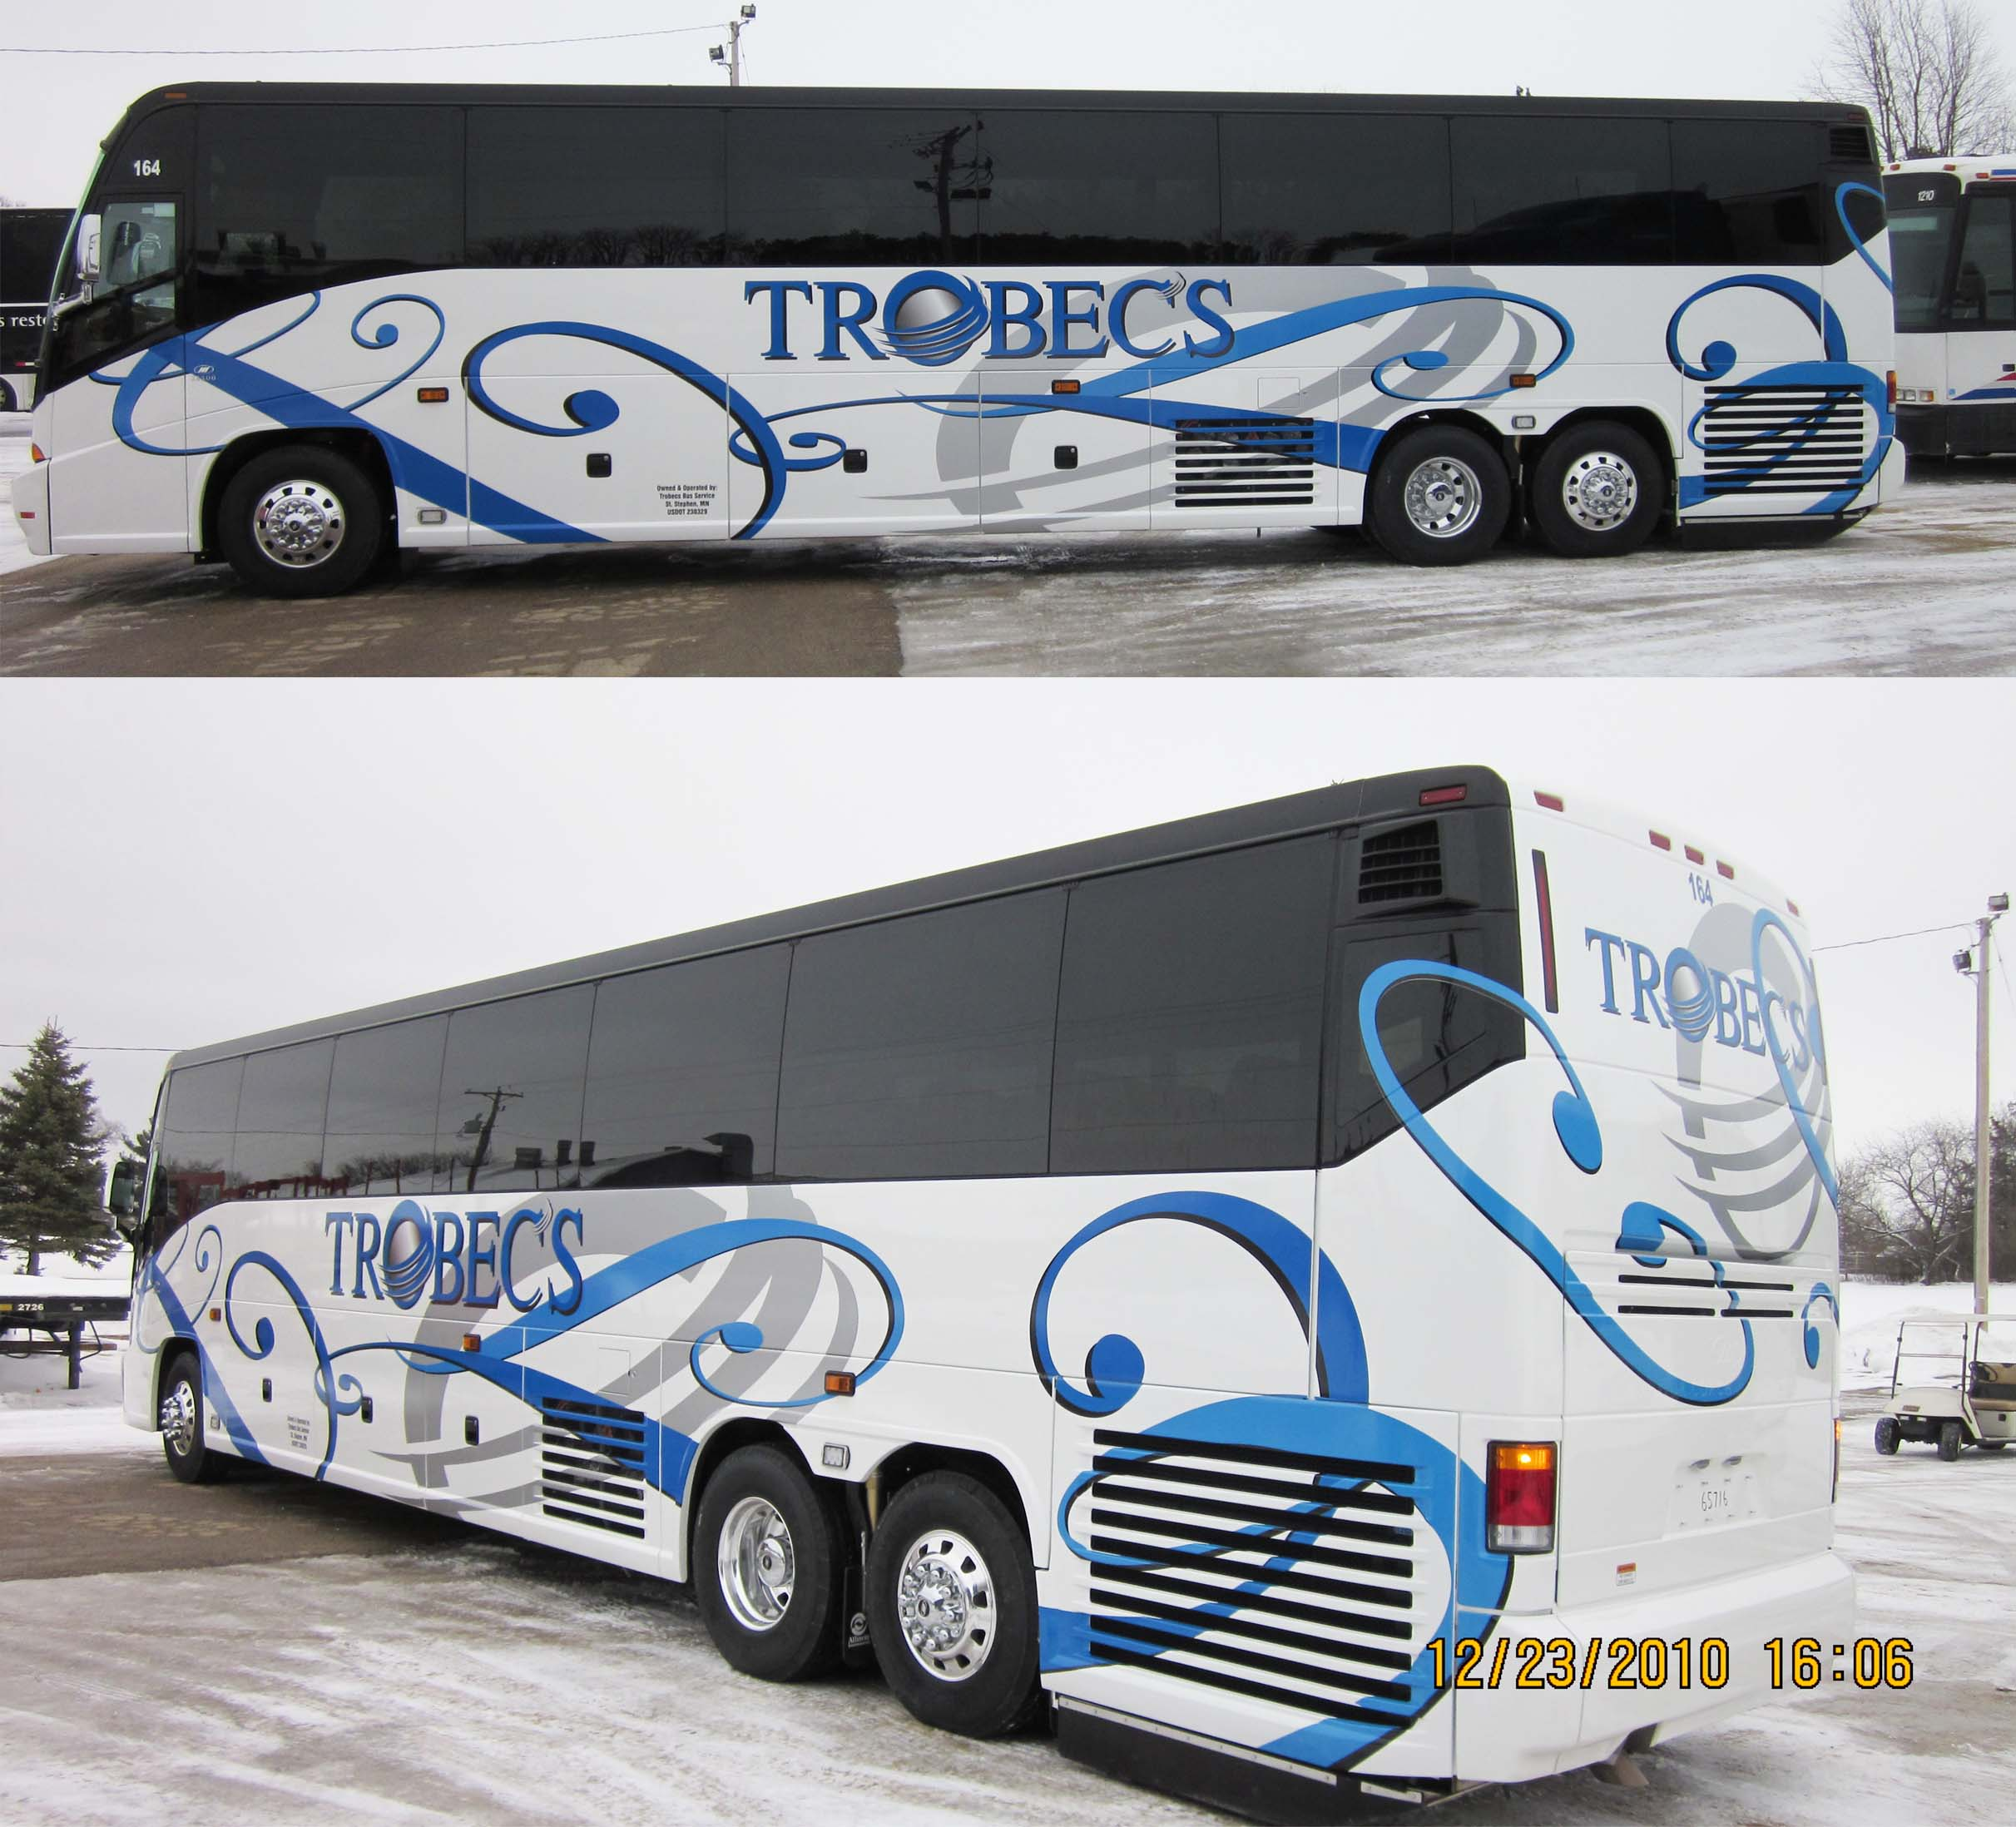 32902 TROBEC'S VINYL GRAPHIC (10).jpg